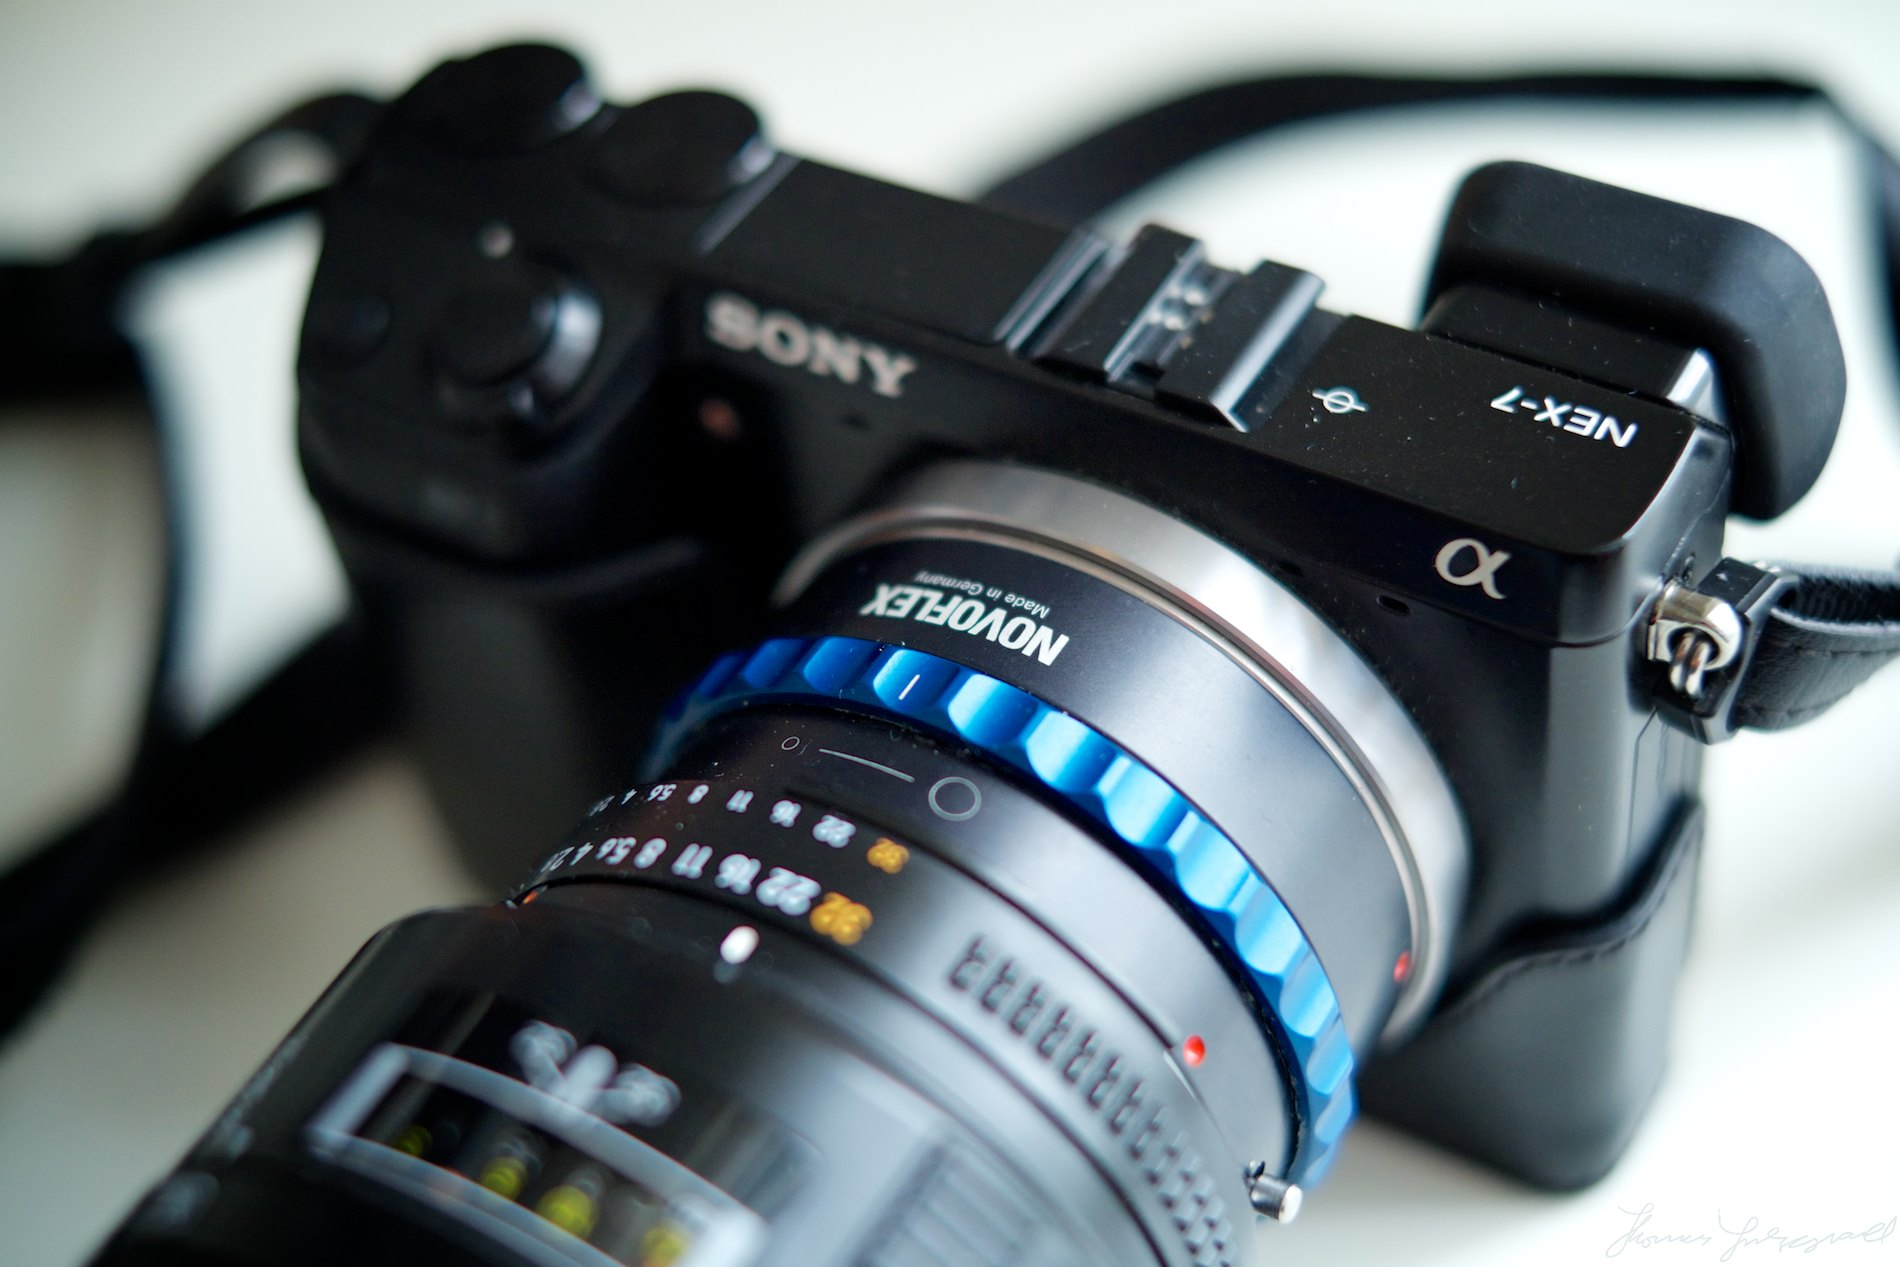 Sony-Nex-7-and-nikon-lens3